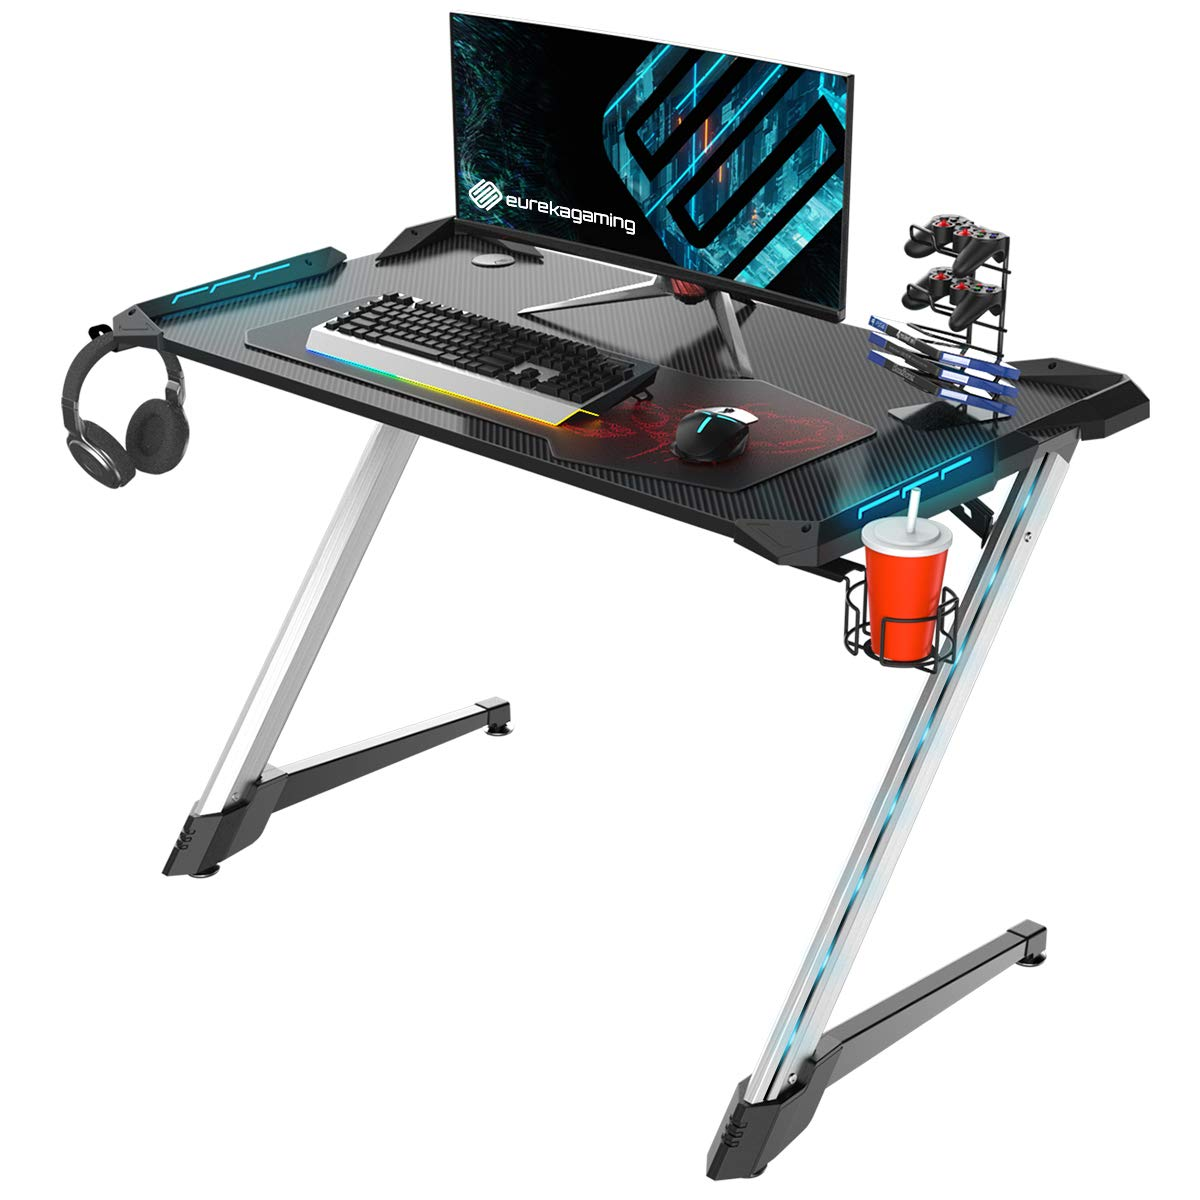 EUREKA ERGONOMIC Z1S PRO Gaming Computer Desk RGB LED Lights 44.5 inch Z Shaped Home Office PC Gaming Desks Table with Cup Holder Headset Hook & Mouse Pad, Sliver